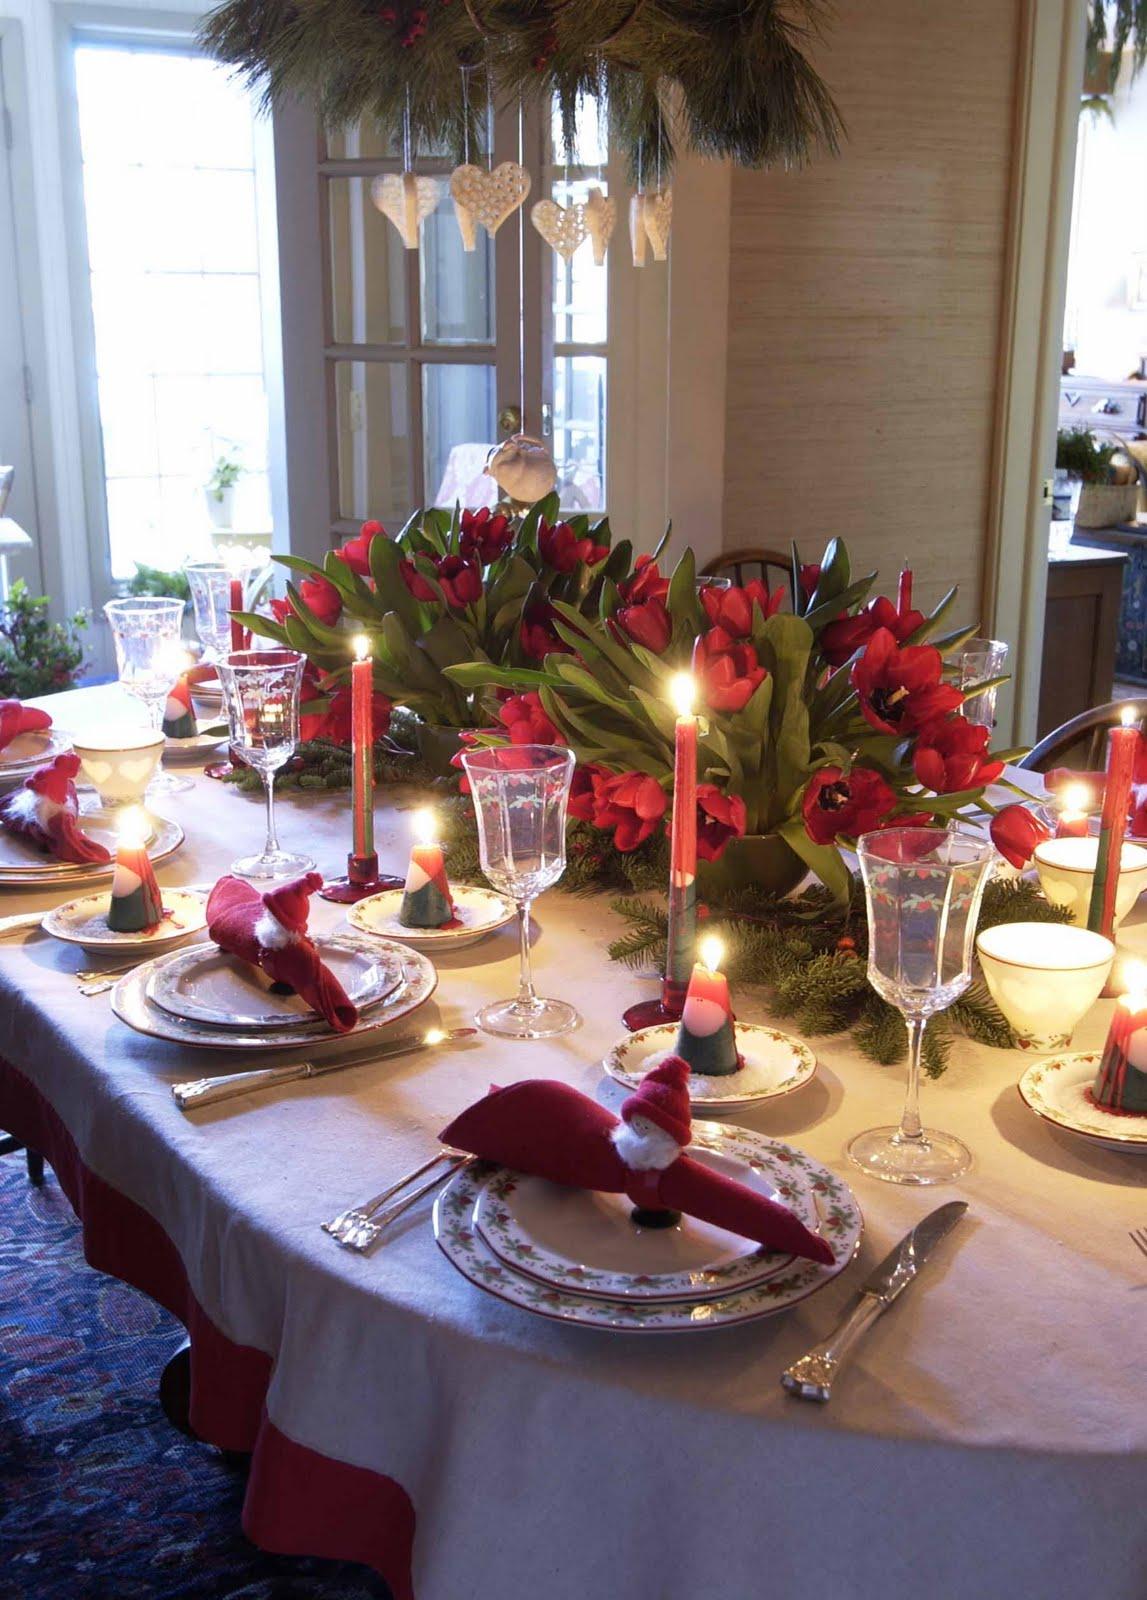 Enjoyable 35 Christmas Table Decoration Ideas For 2017 Wow Decor Interior Design Ideas Clesiryabchikinfo